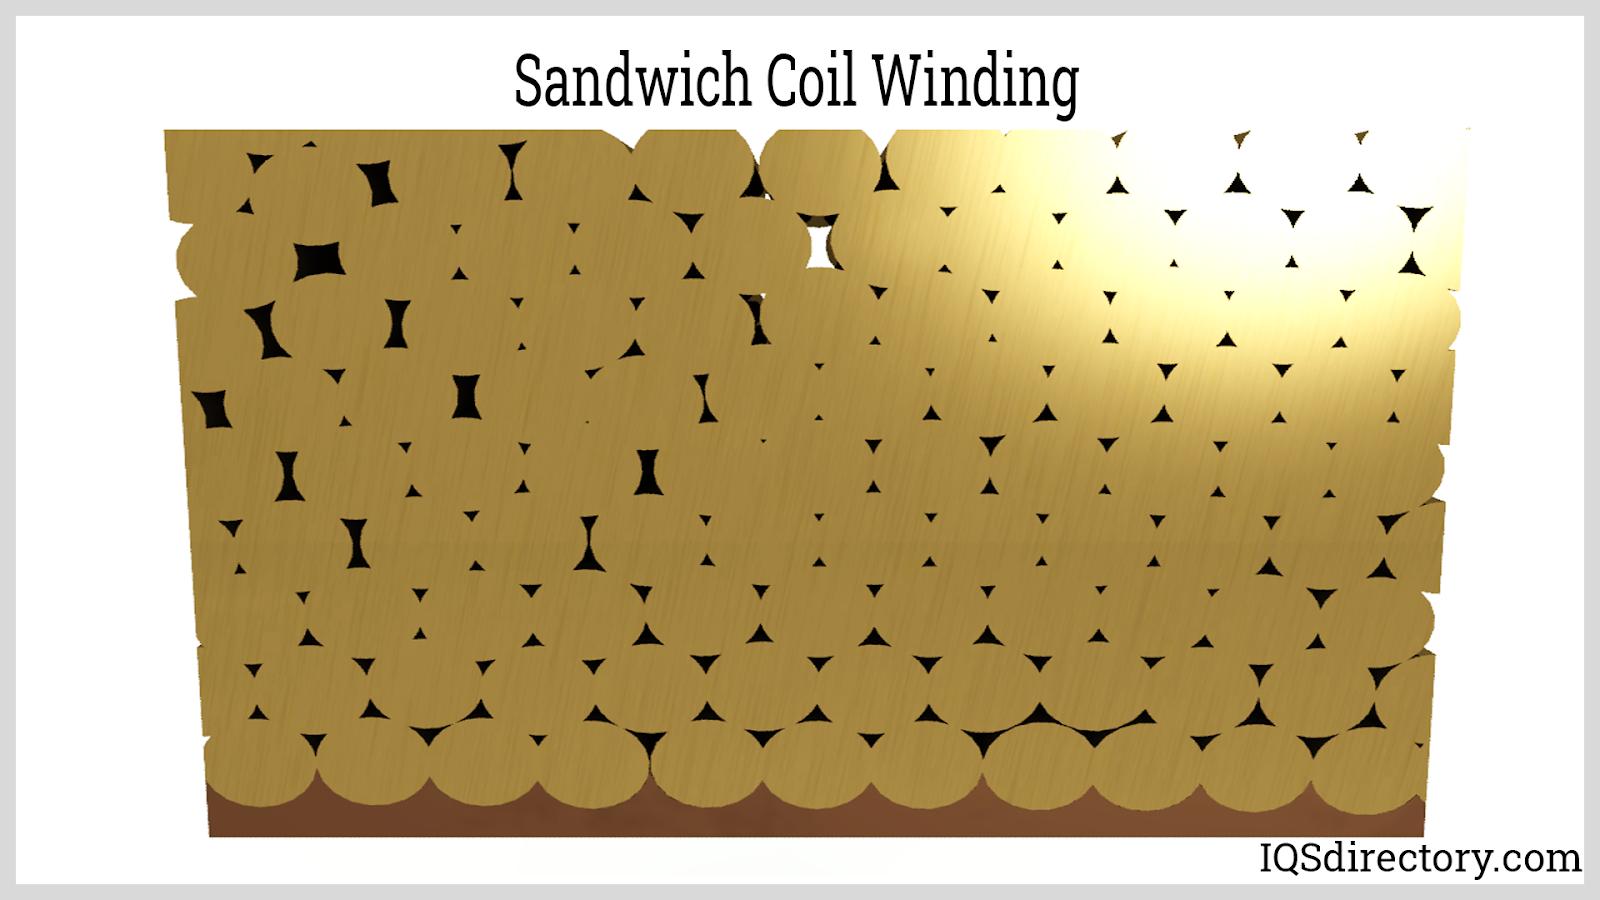 Sandwich Coil Winding